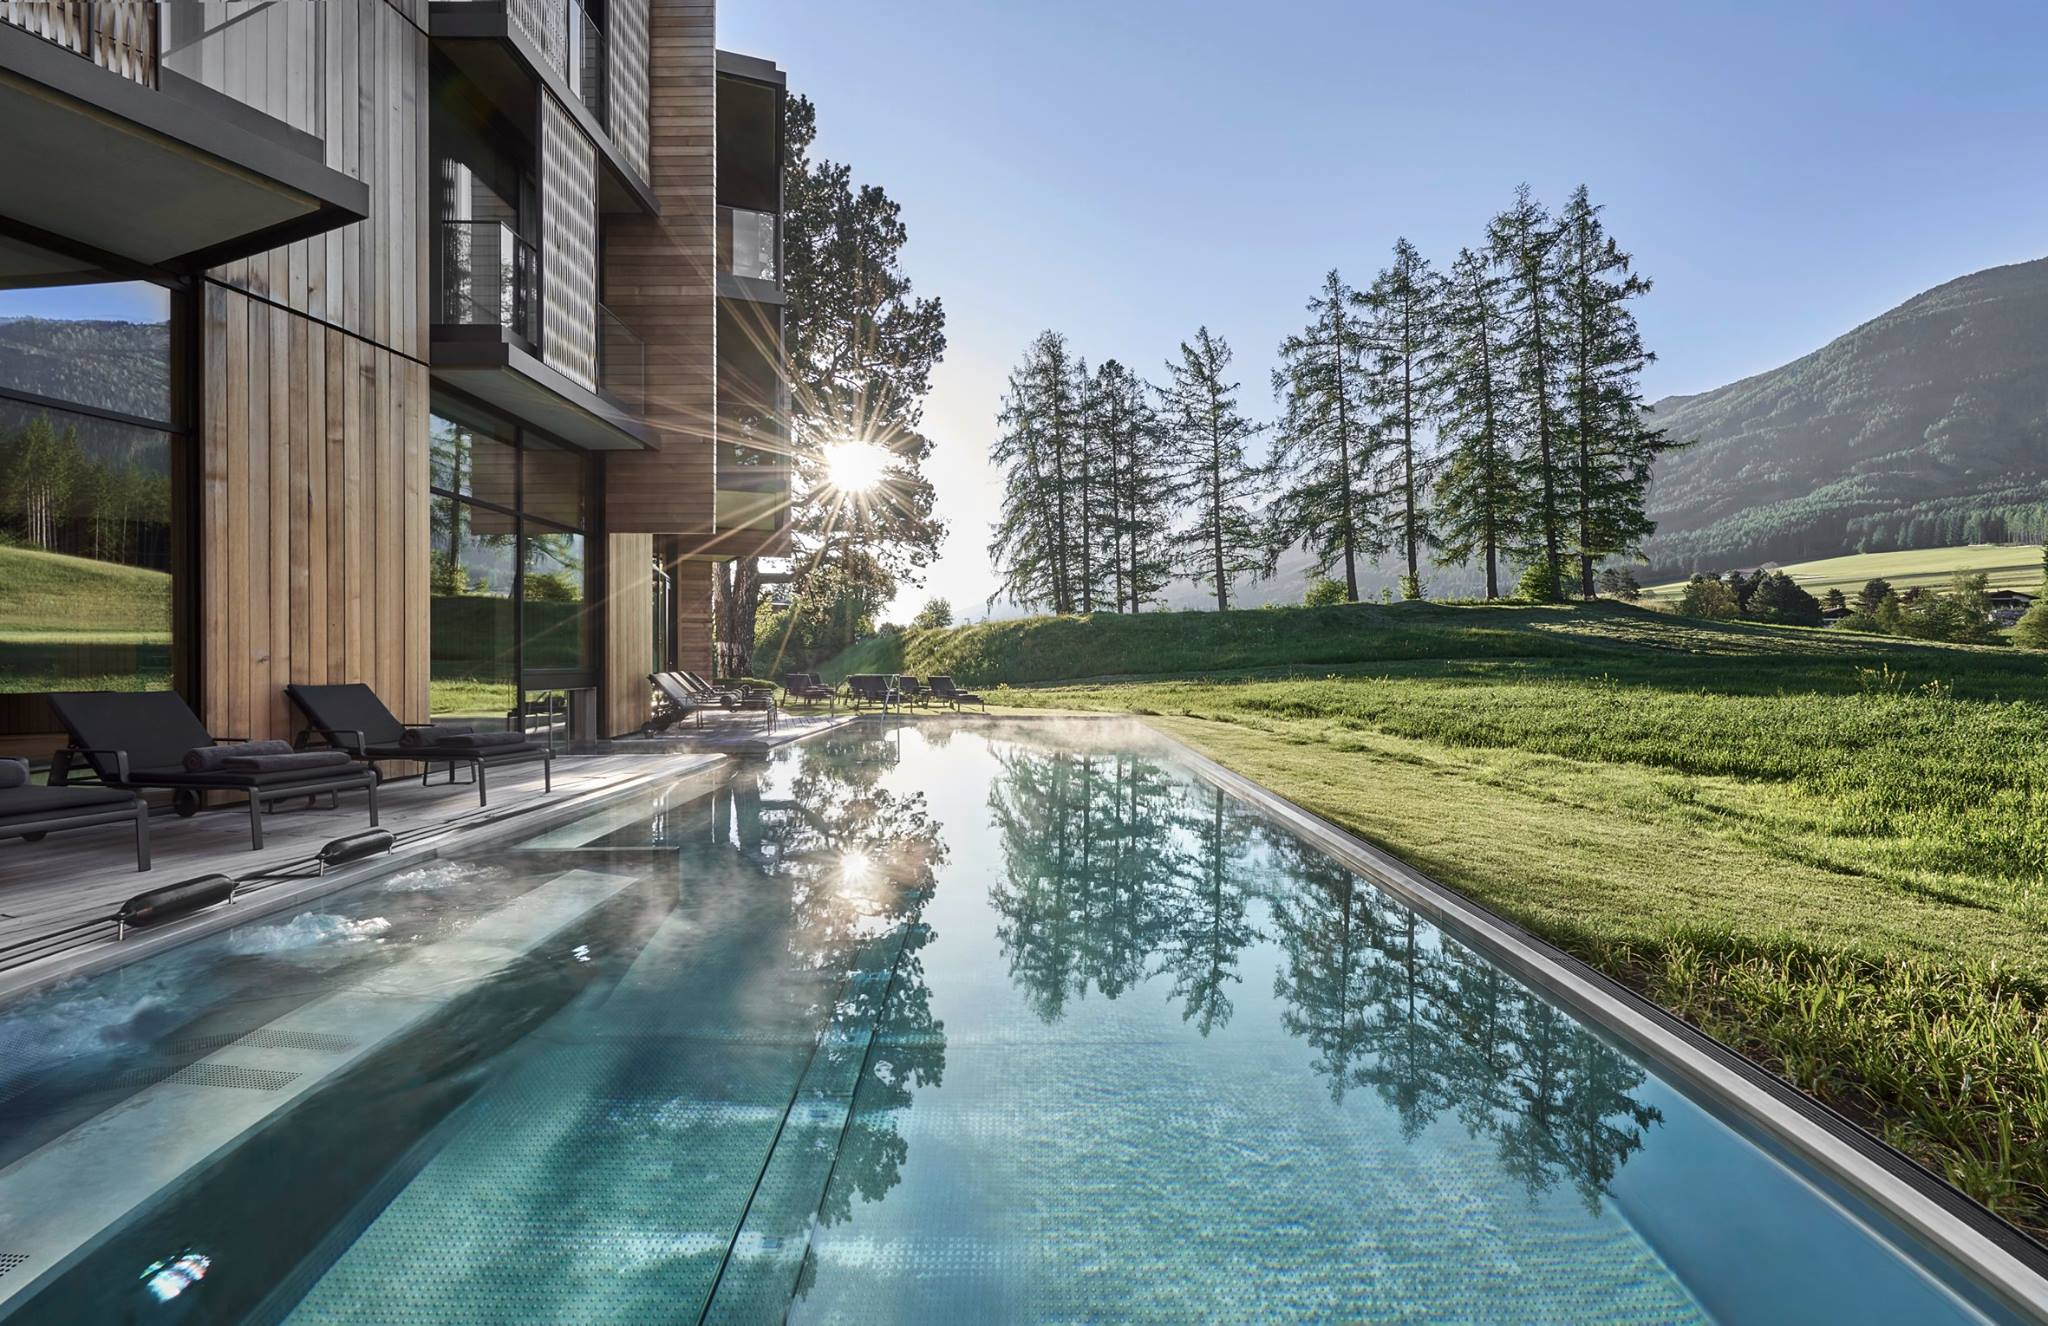 5 Hotels: Wellness & Detox - Lanserhof Tegernsee | Love Daily Dose